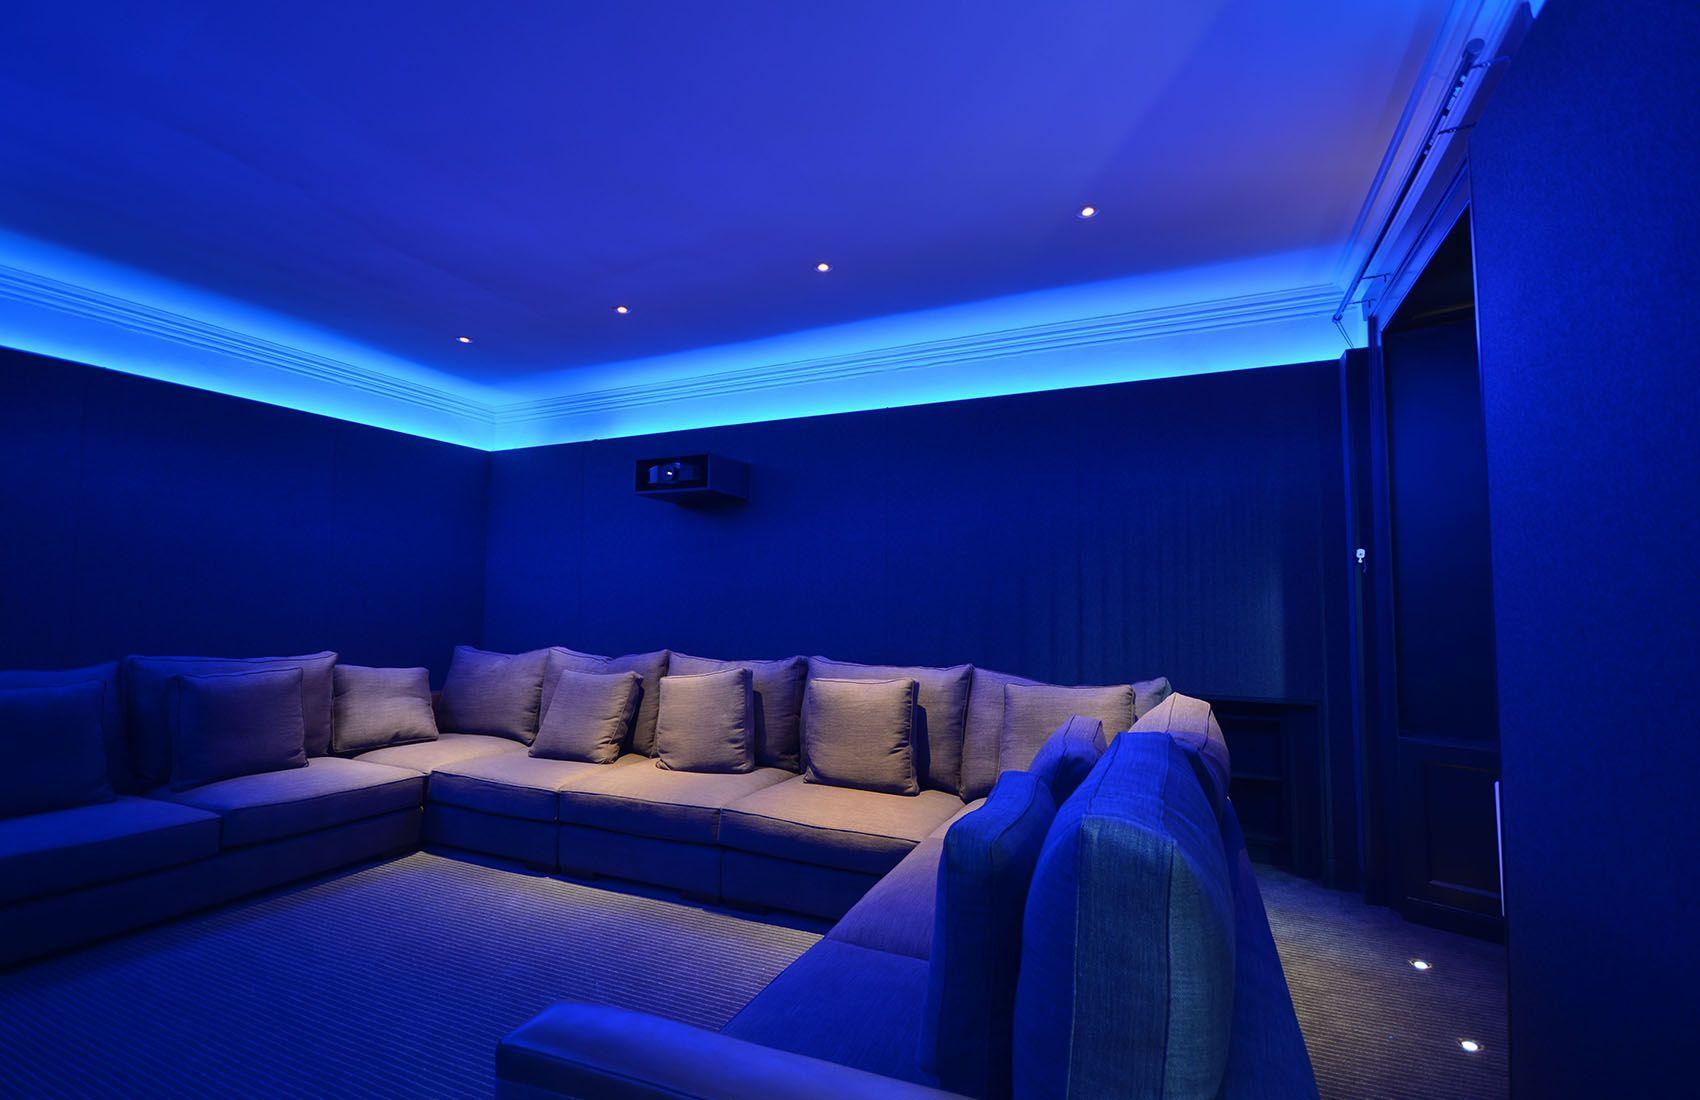 Modern Home Cinema Room Bespoke Walls Lighting And Projector Housing